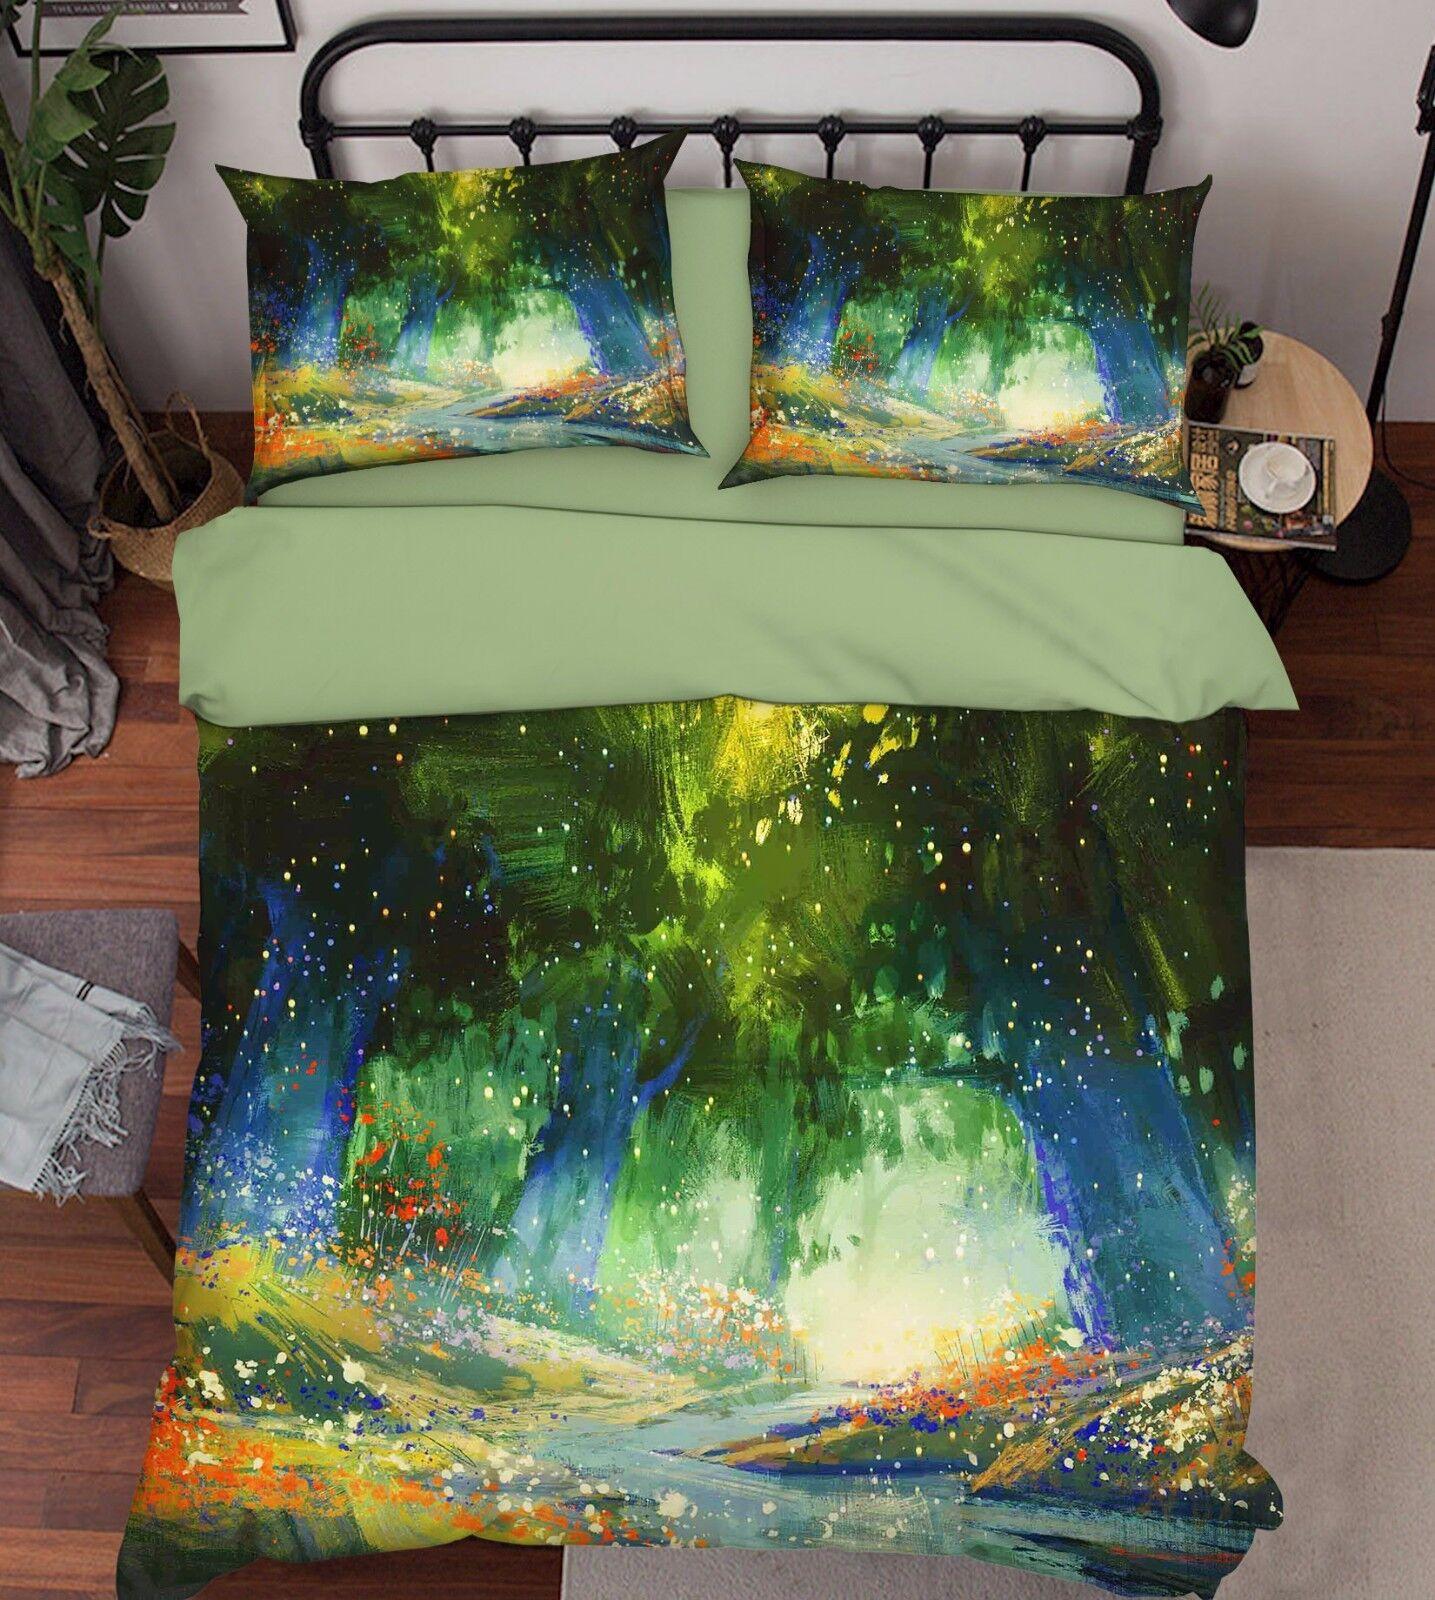 3D Painting 314 Bed Pillowcases Quilt Duvet Cover Set Single Queen King Size AU